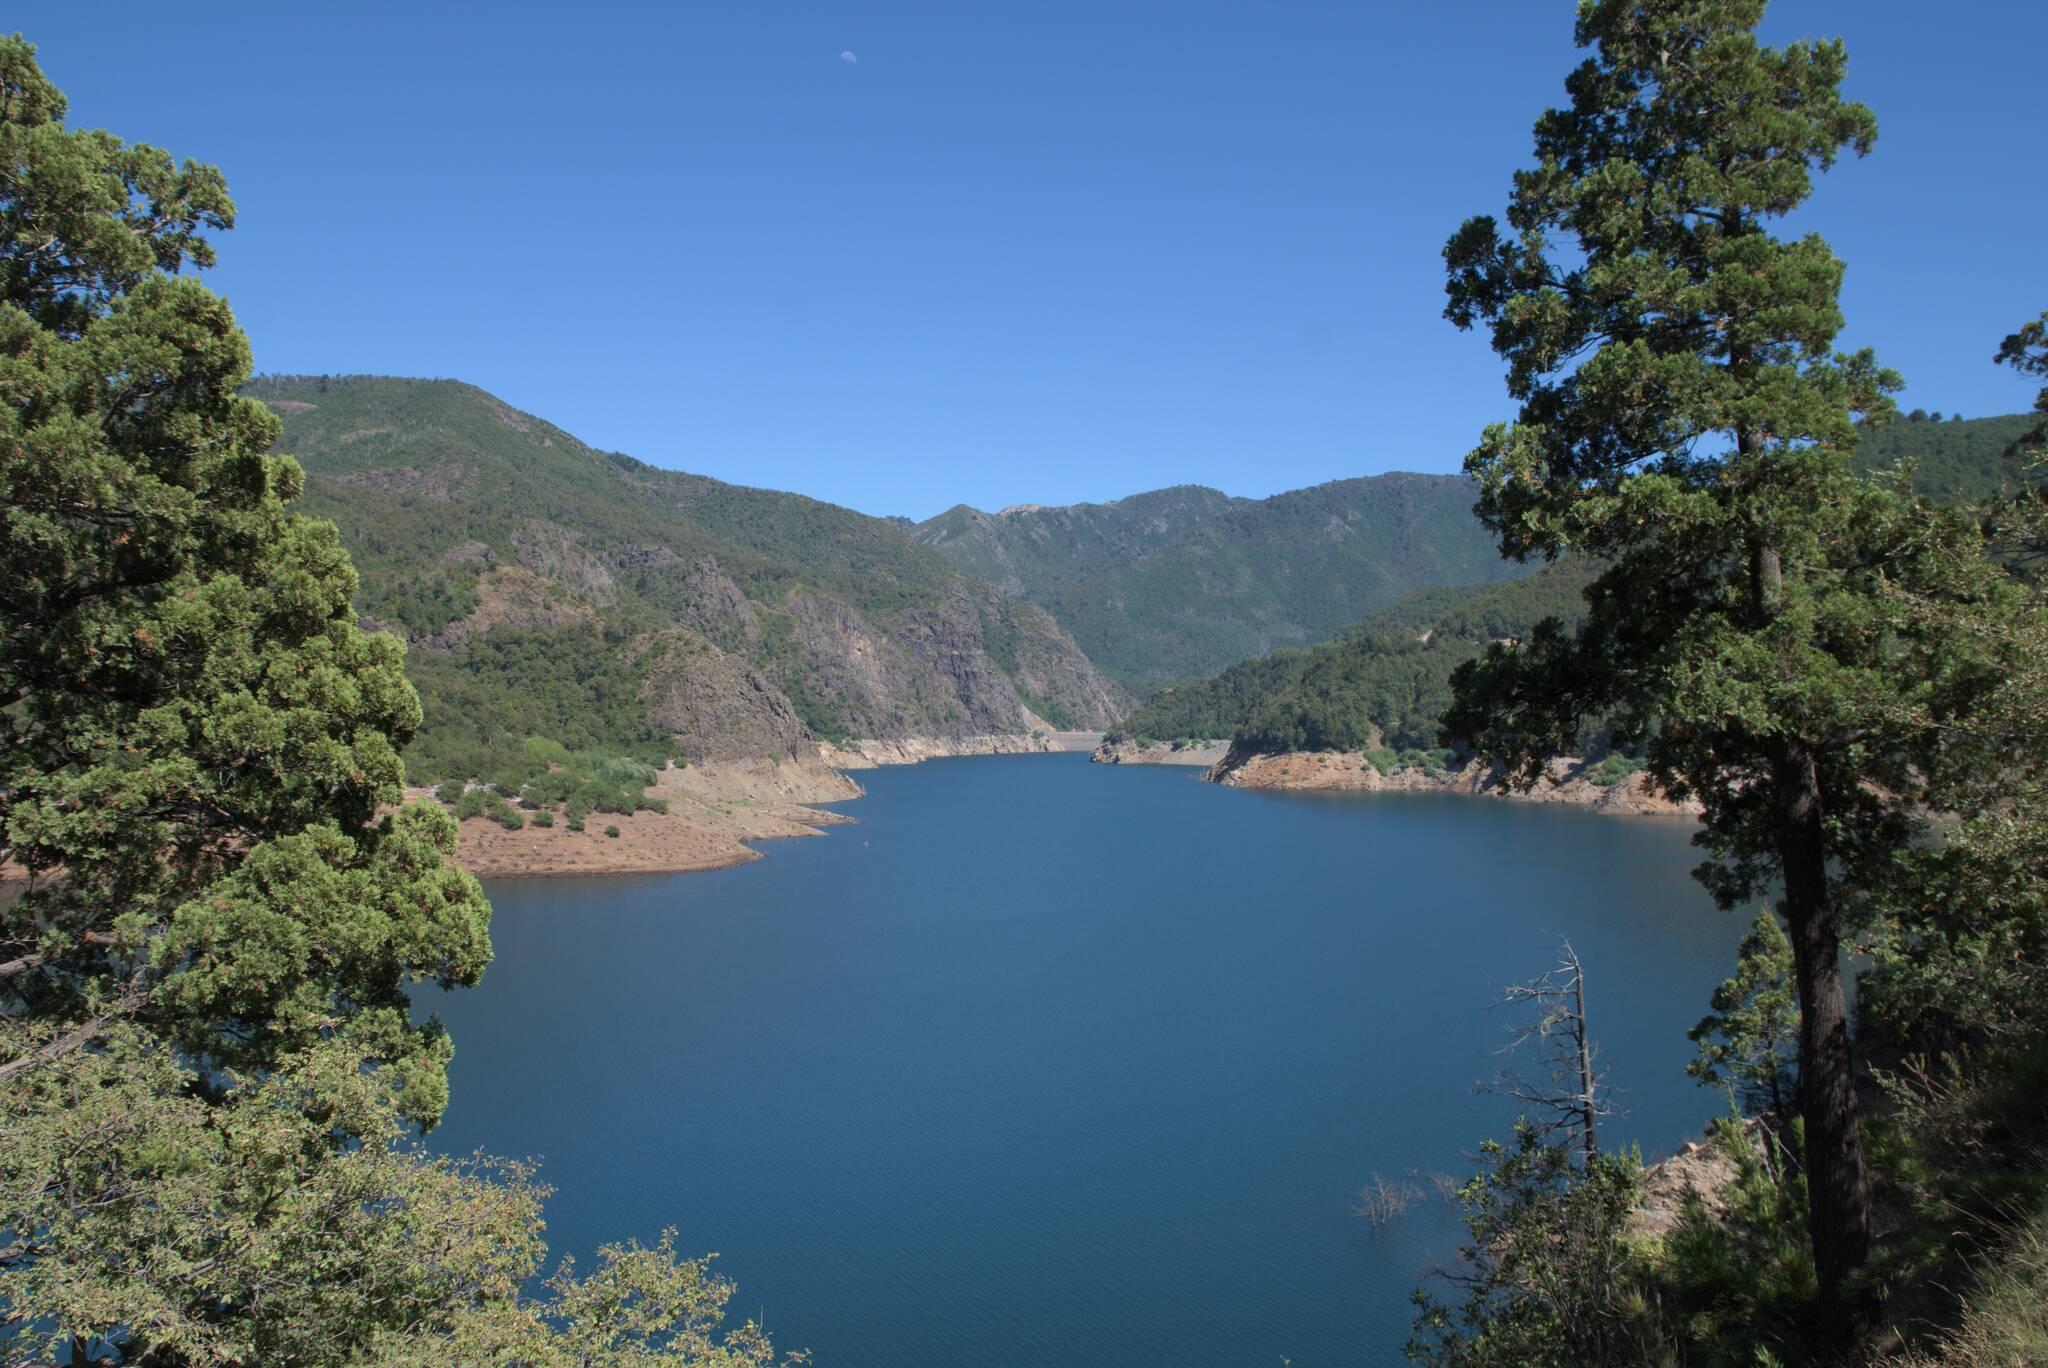 Kolejny zbiornik na Biobio, jezioro Ralco